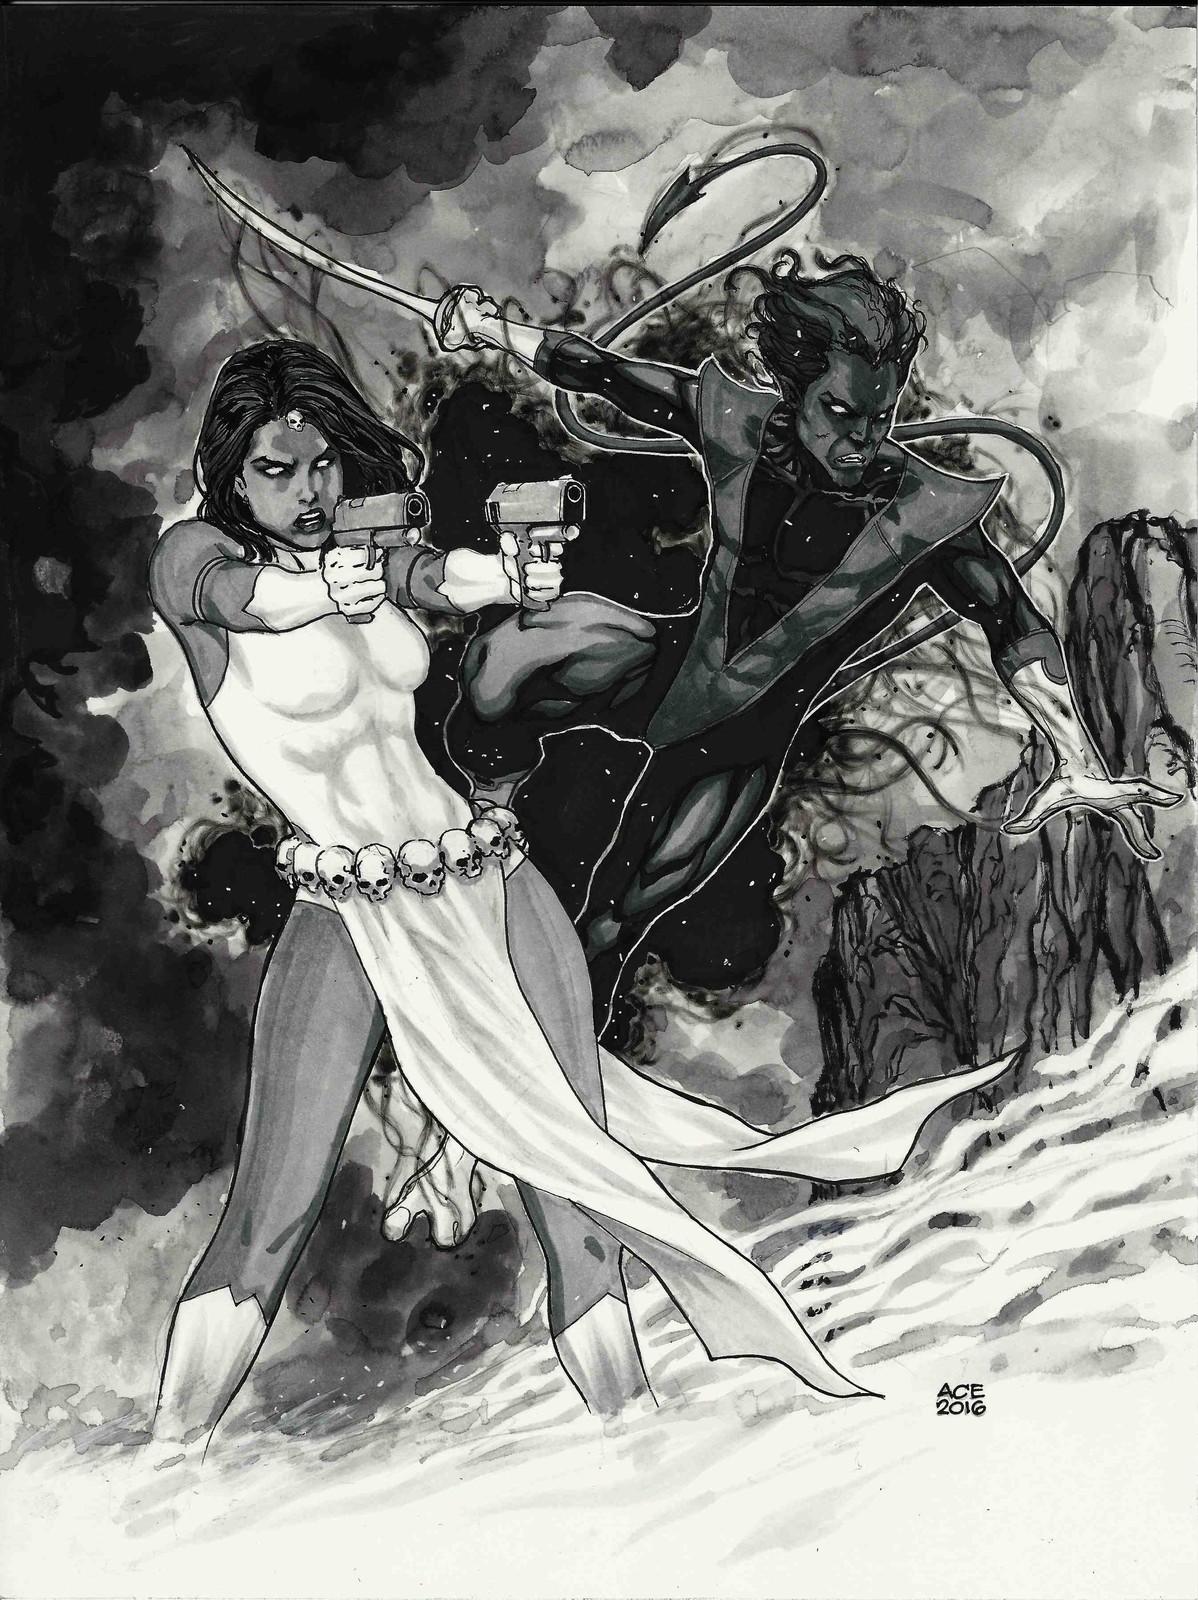 Mystique and Nightcrawler commission